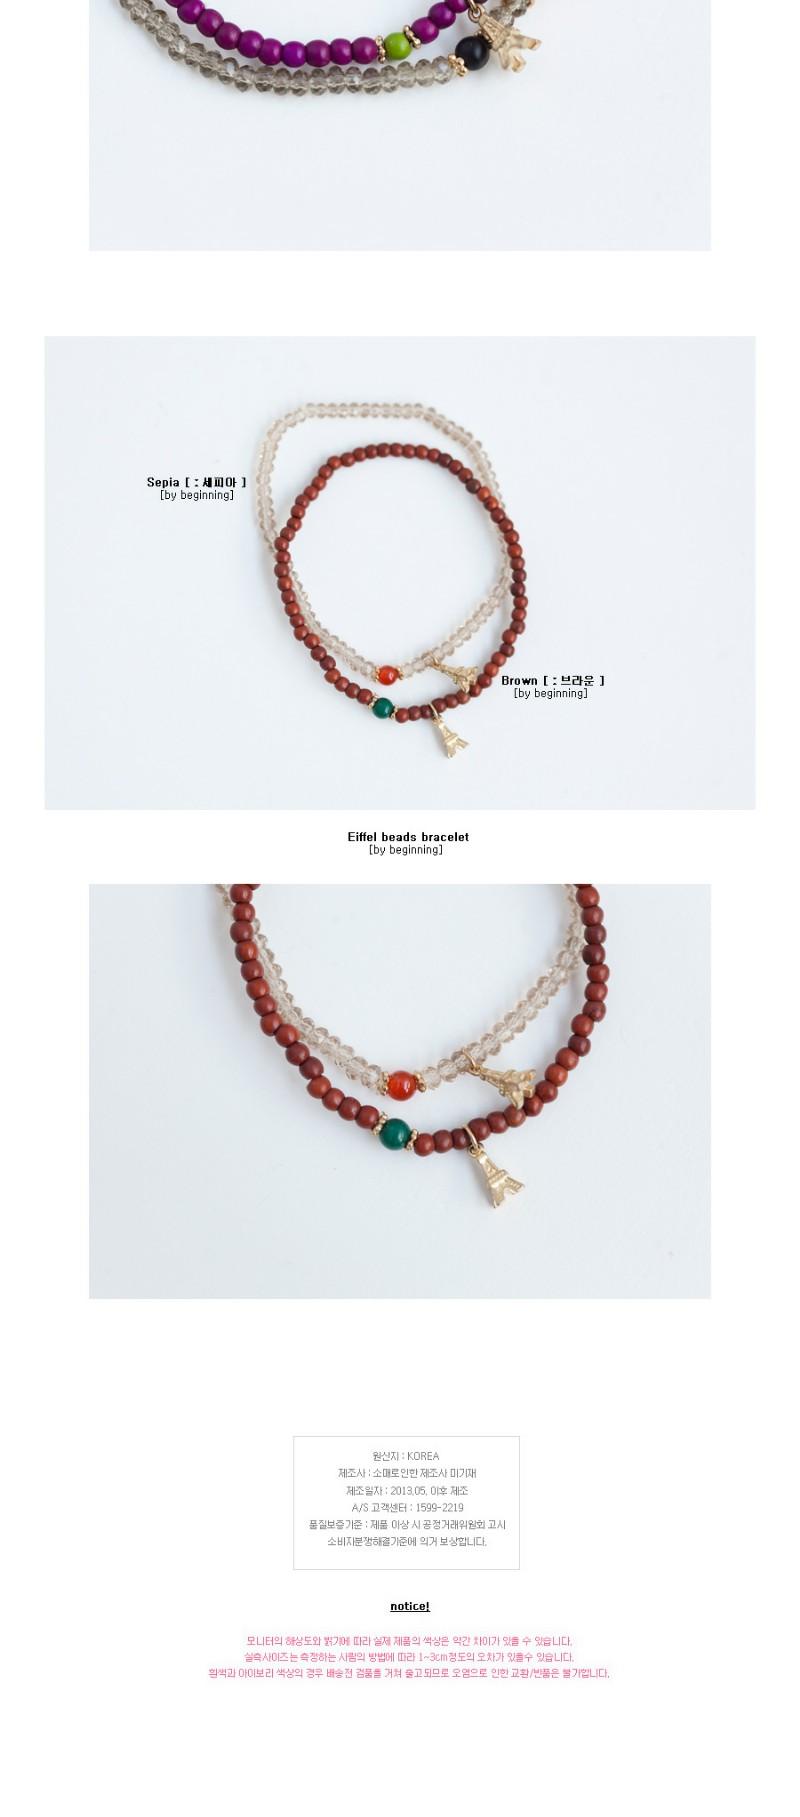 Eiffel beads bracelet